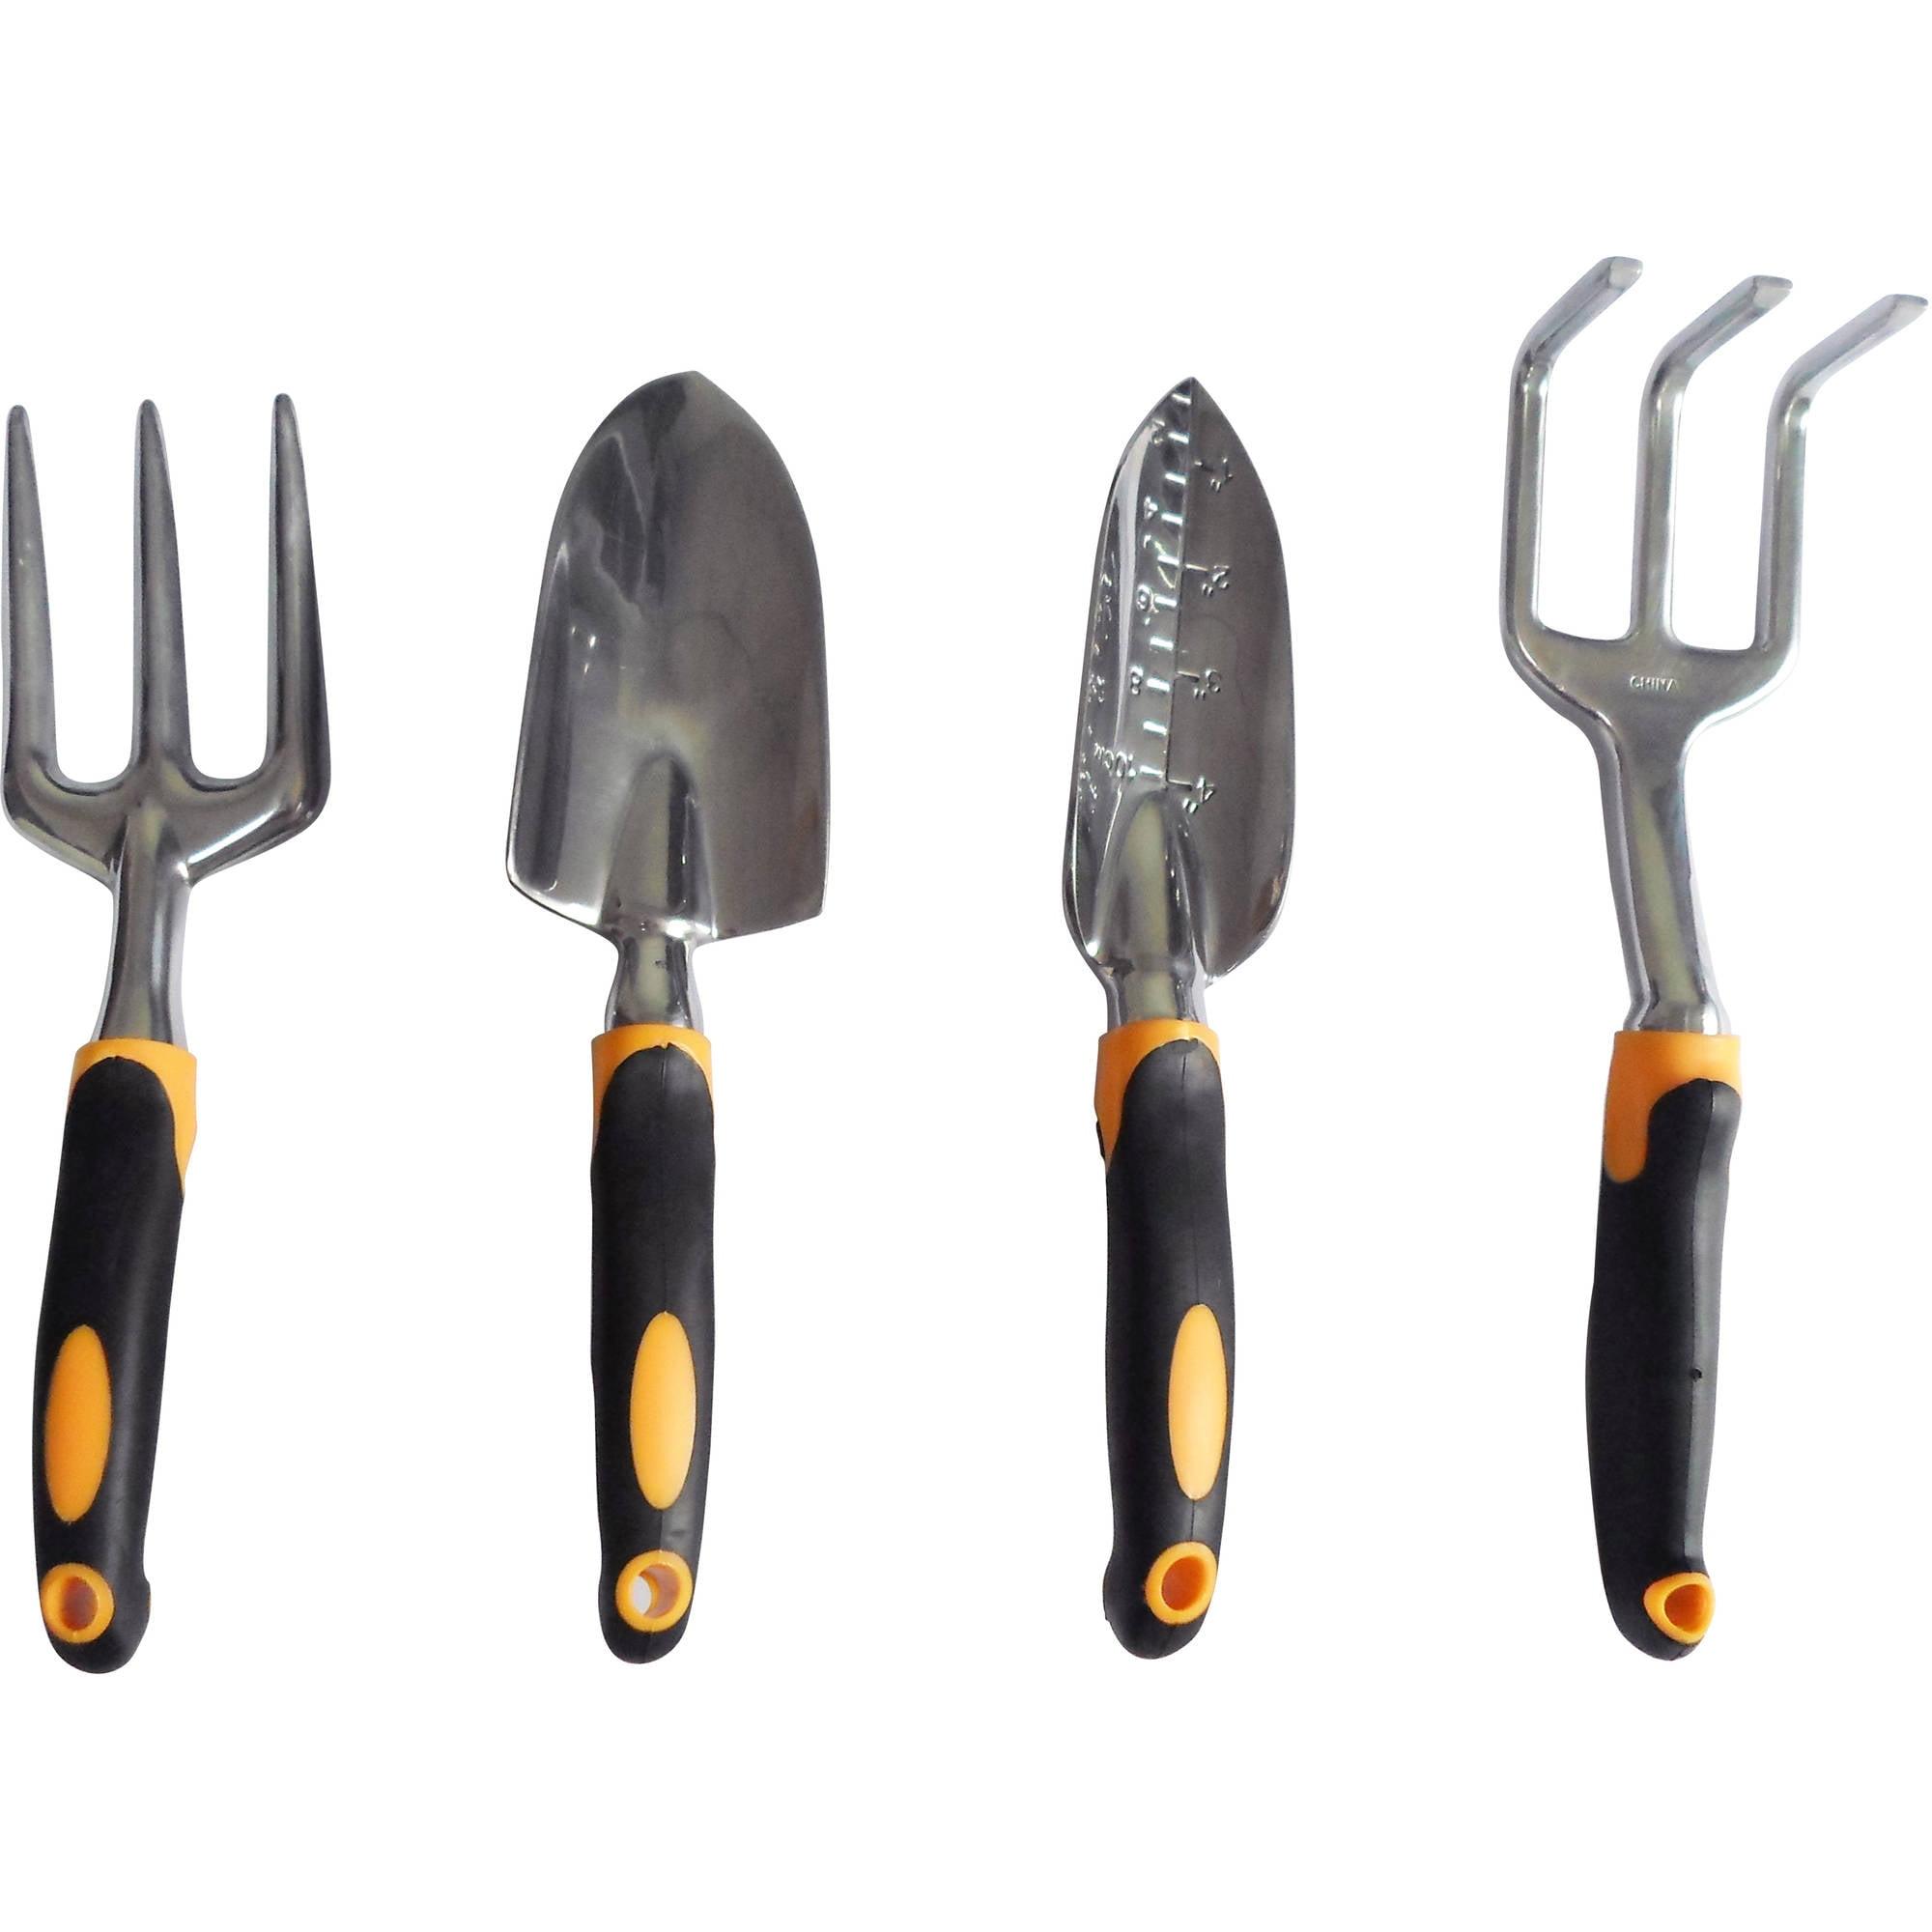 GardenHOME Ergonomic and Durable 4-Piece Garden Tool Set by Aspectek